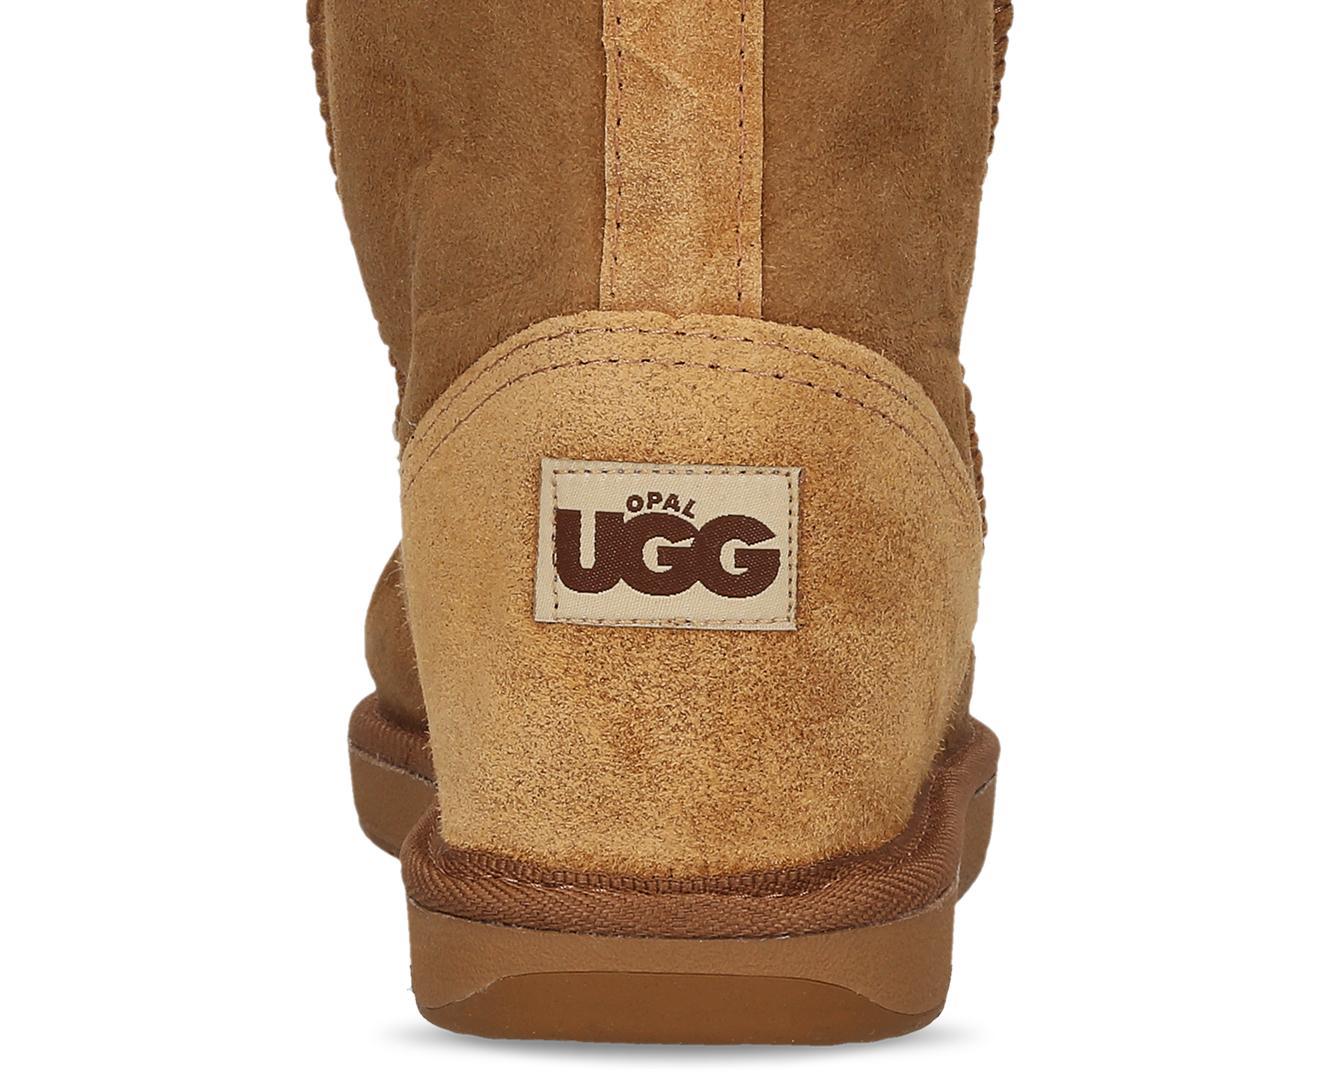 06c59f2bf6e Opal UGG Australian Made Tidal 3/4 Sheepskin Boots - Chestnut